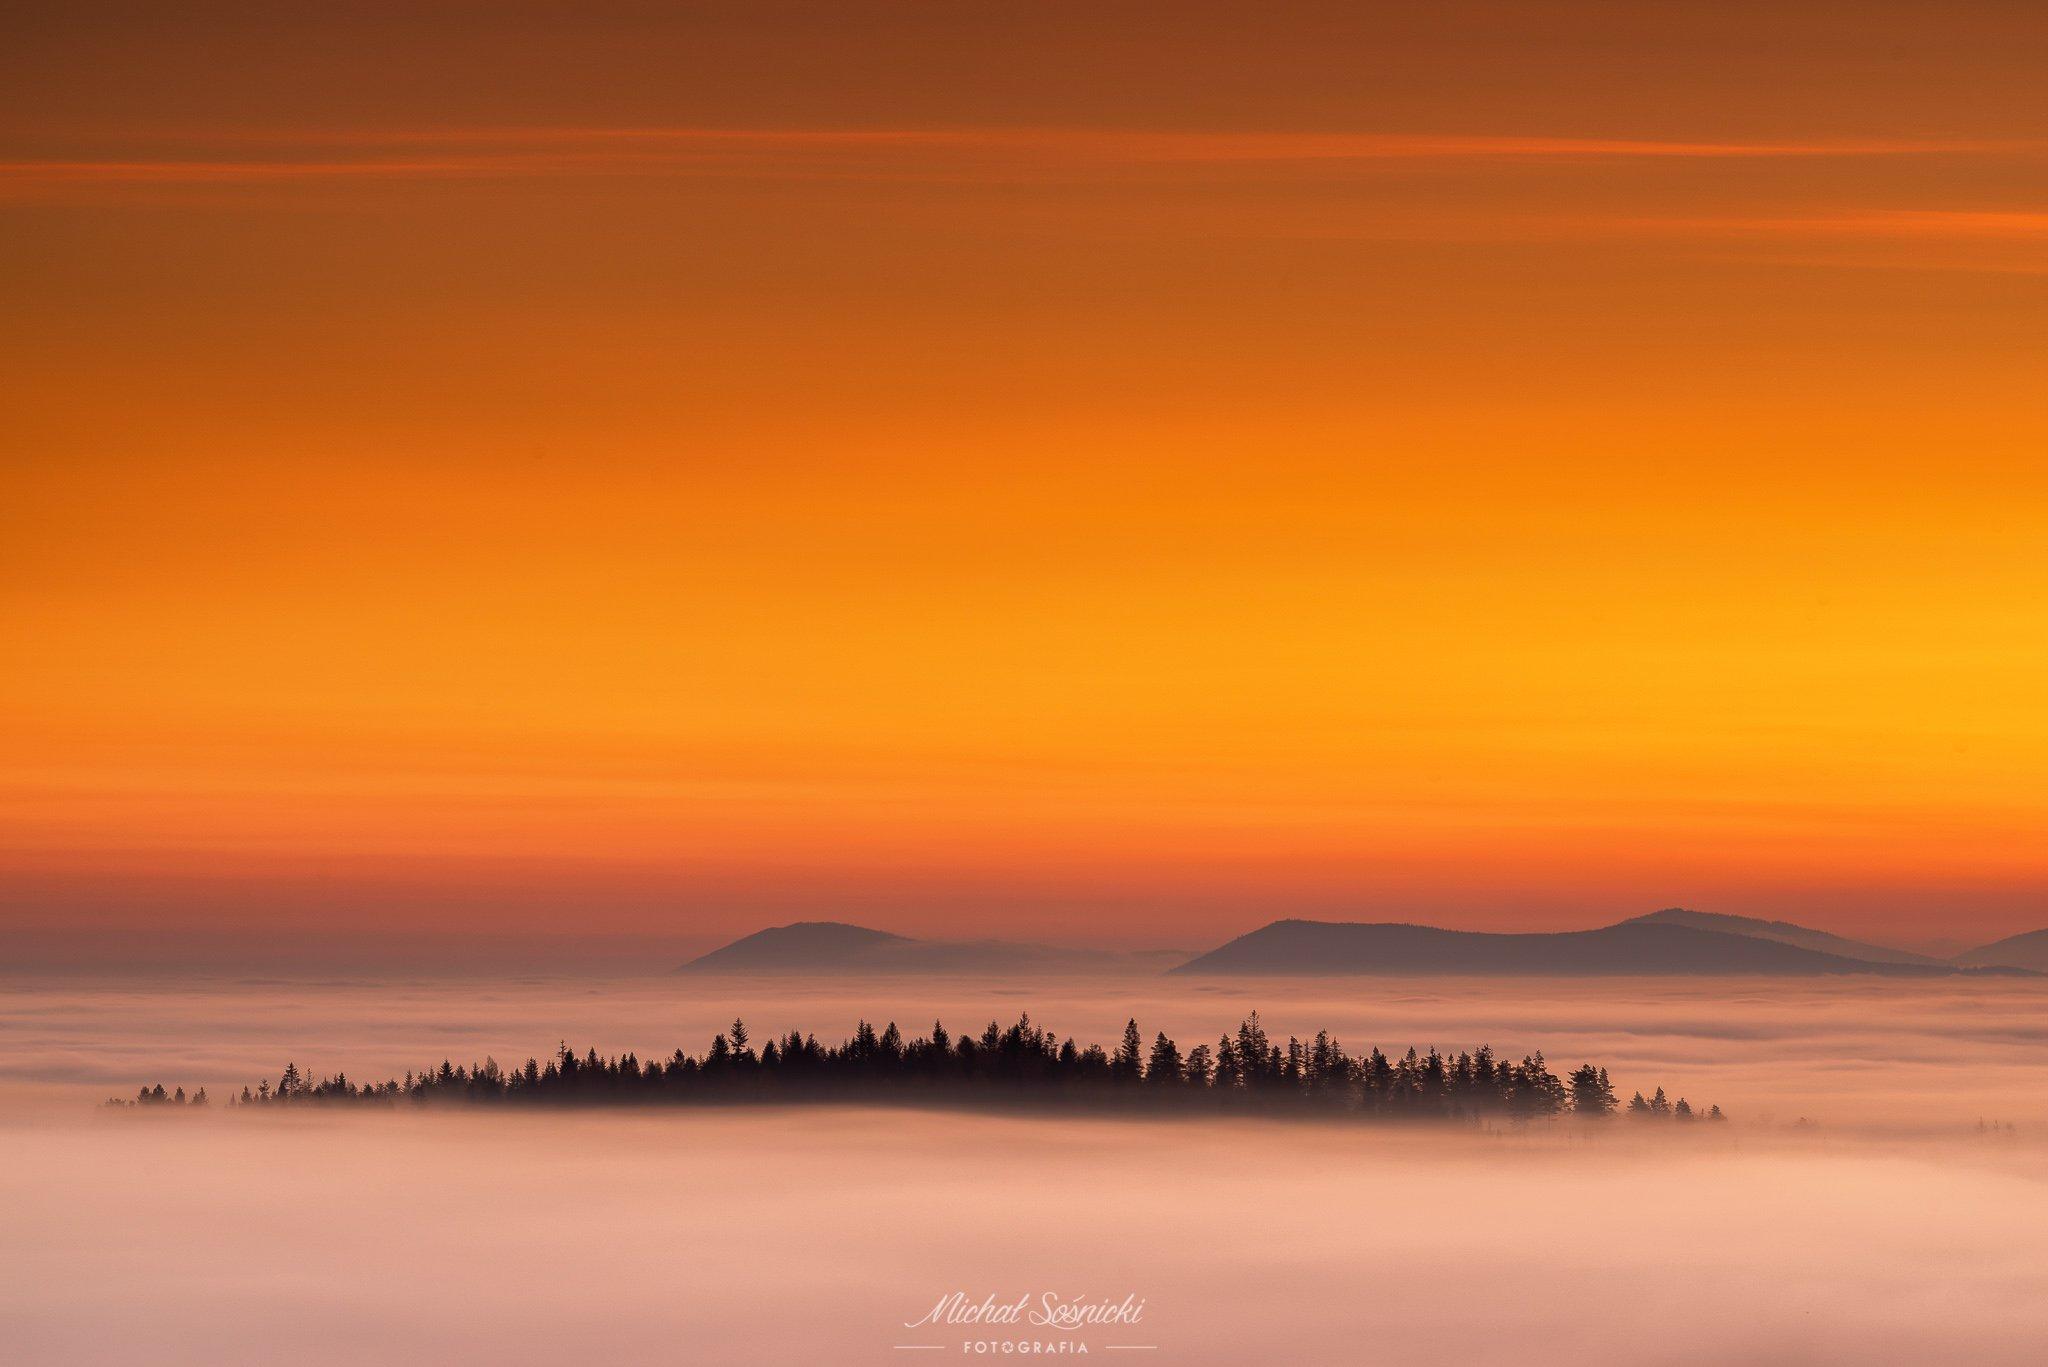 #poland #sunrise #pentax #benro #sky #fog #foggy #color #morning #trees, Sośnicki Michał